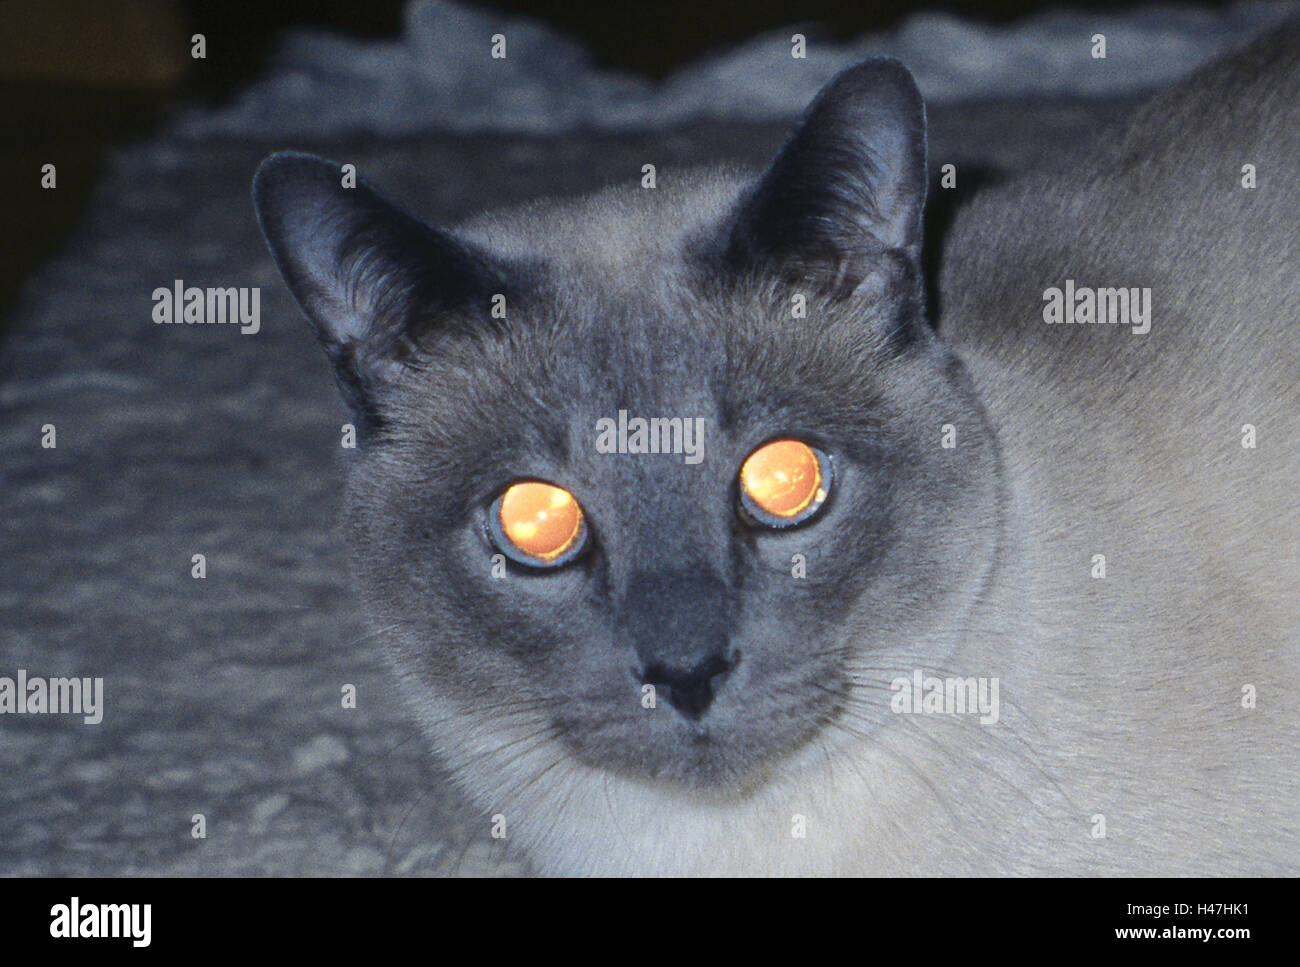 Cats, Tonkanese, darkness, eyes, detail, shine, reflect, animals, mammals, mammal, pets, house cats, portrait, cat's - Stock Image